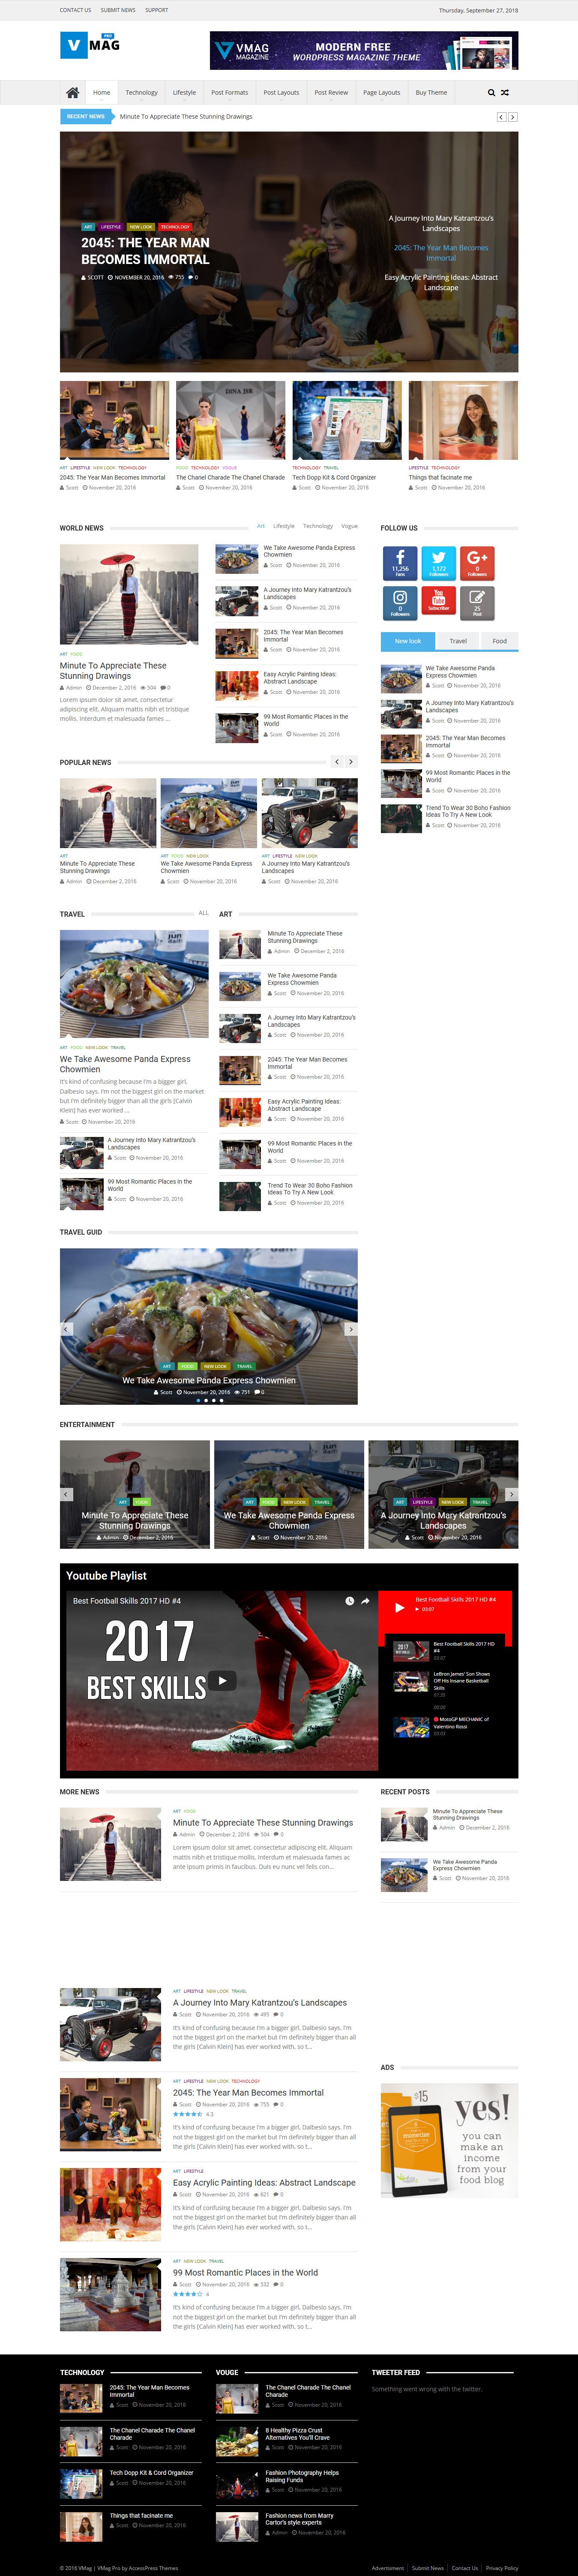 VMag Pro- Best Premium Adsense Optimized WordPress Theme